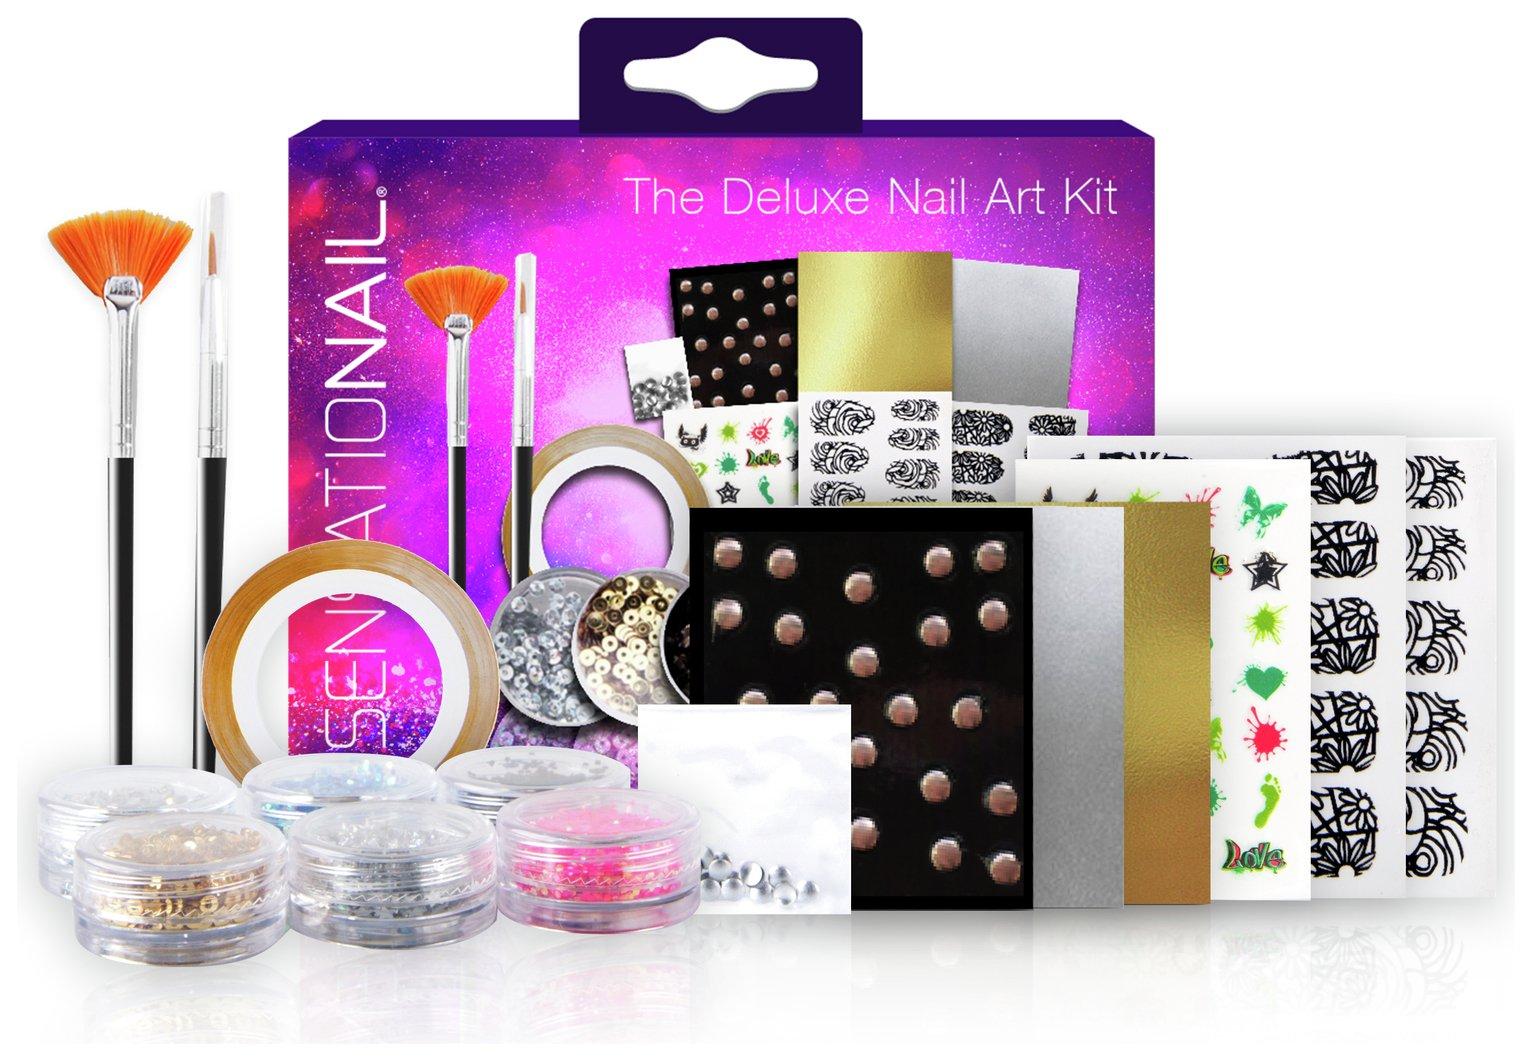 SensatioNail Deluxe Nail Art Kit